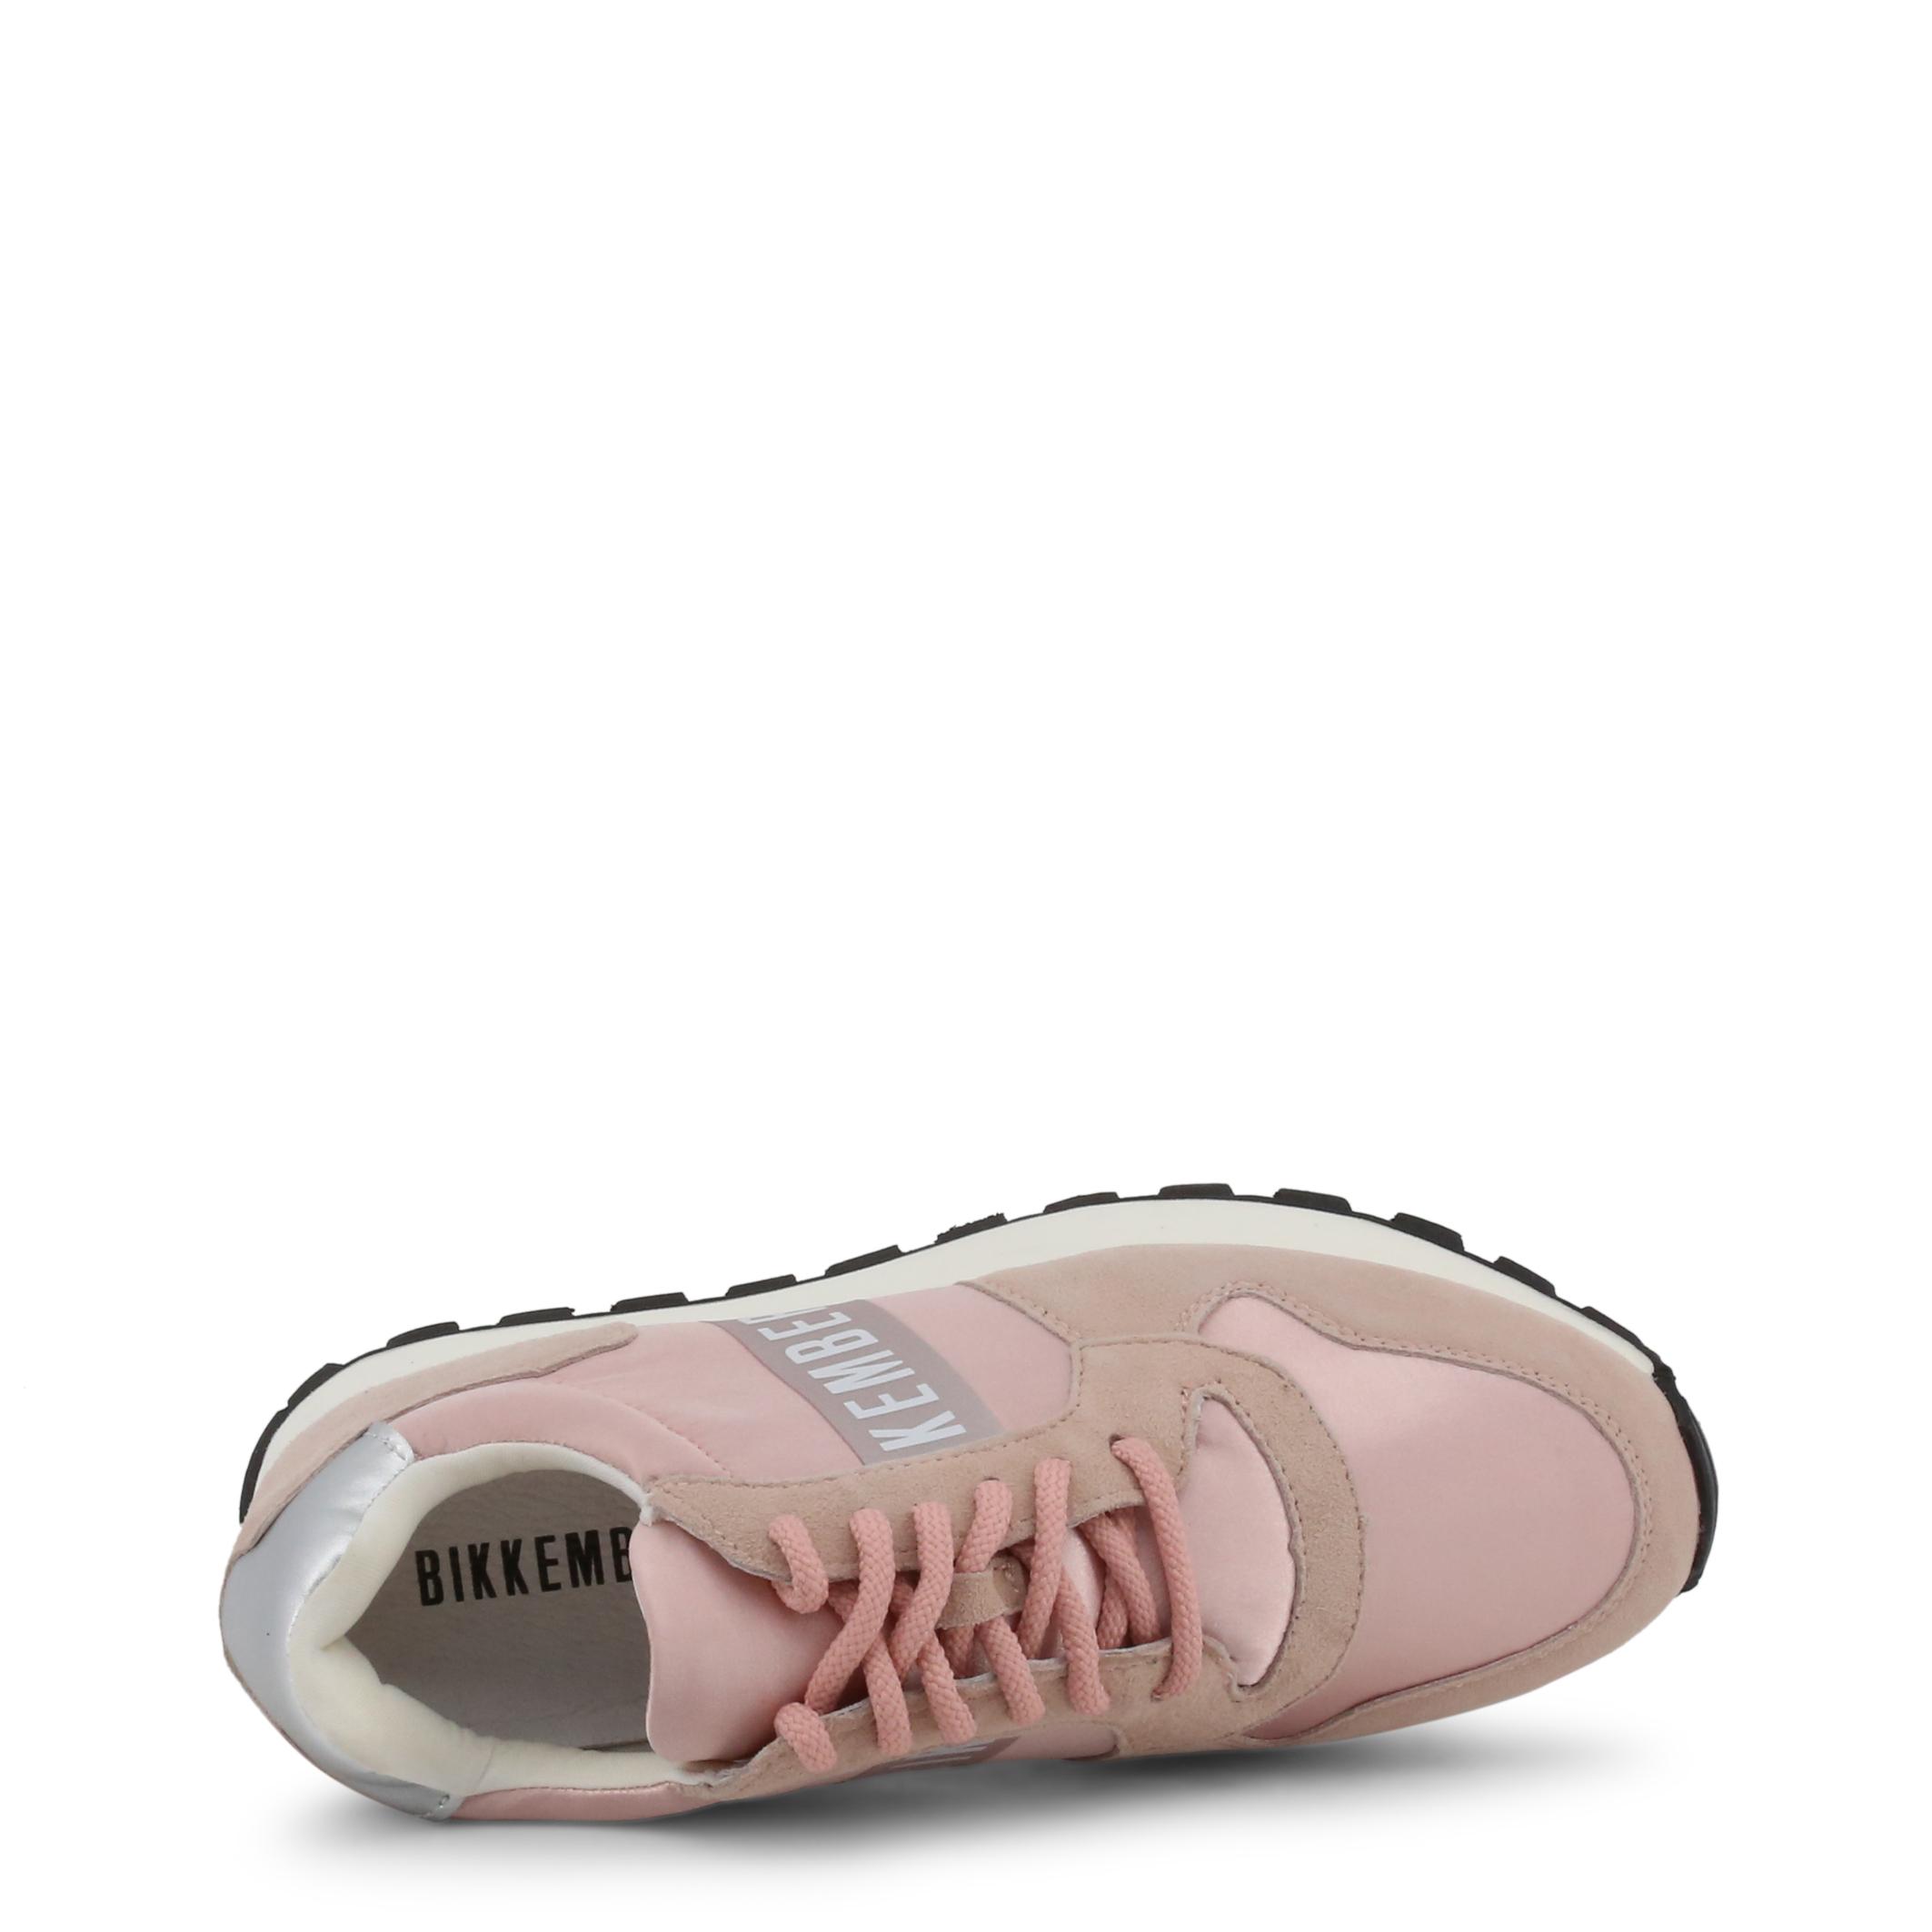 Baskets / Sneakers  Bikkembergs FEND-ER_2087 pink